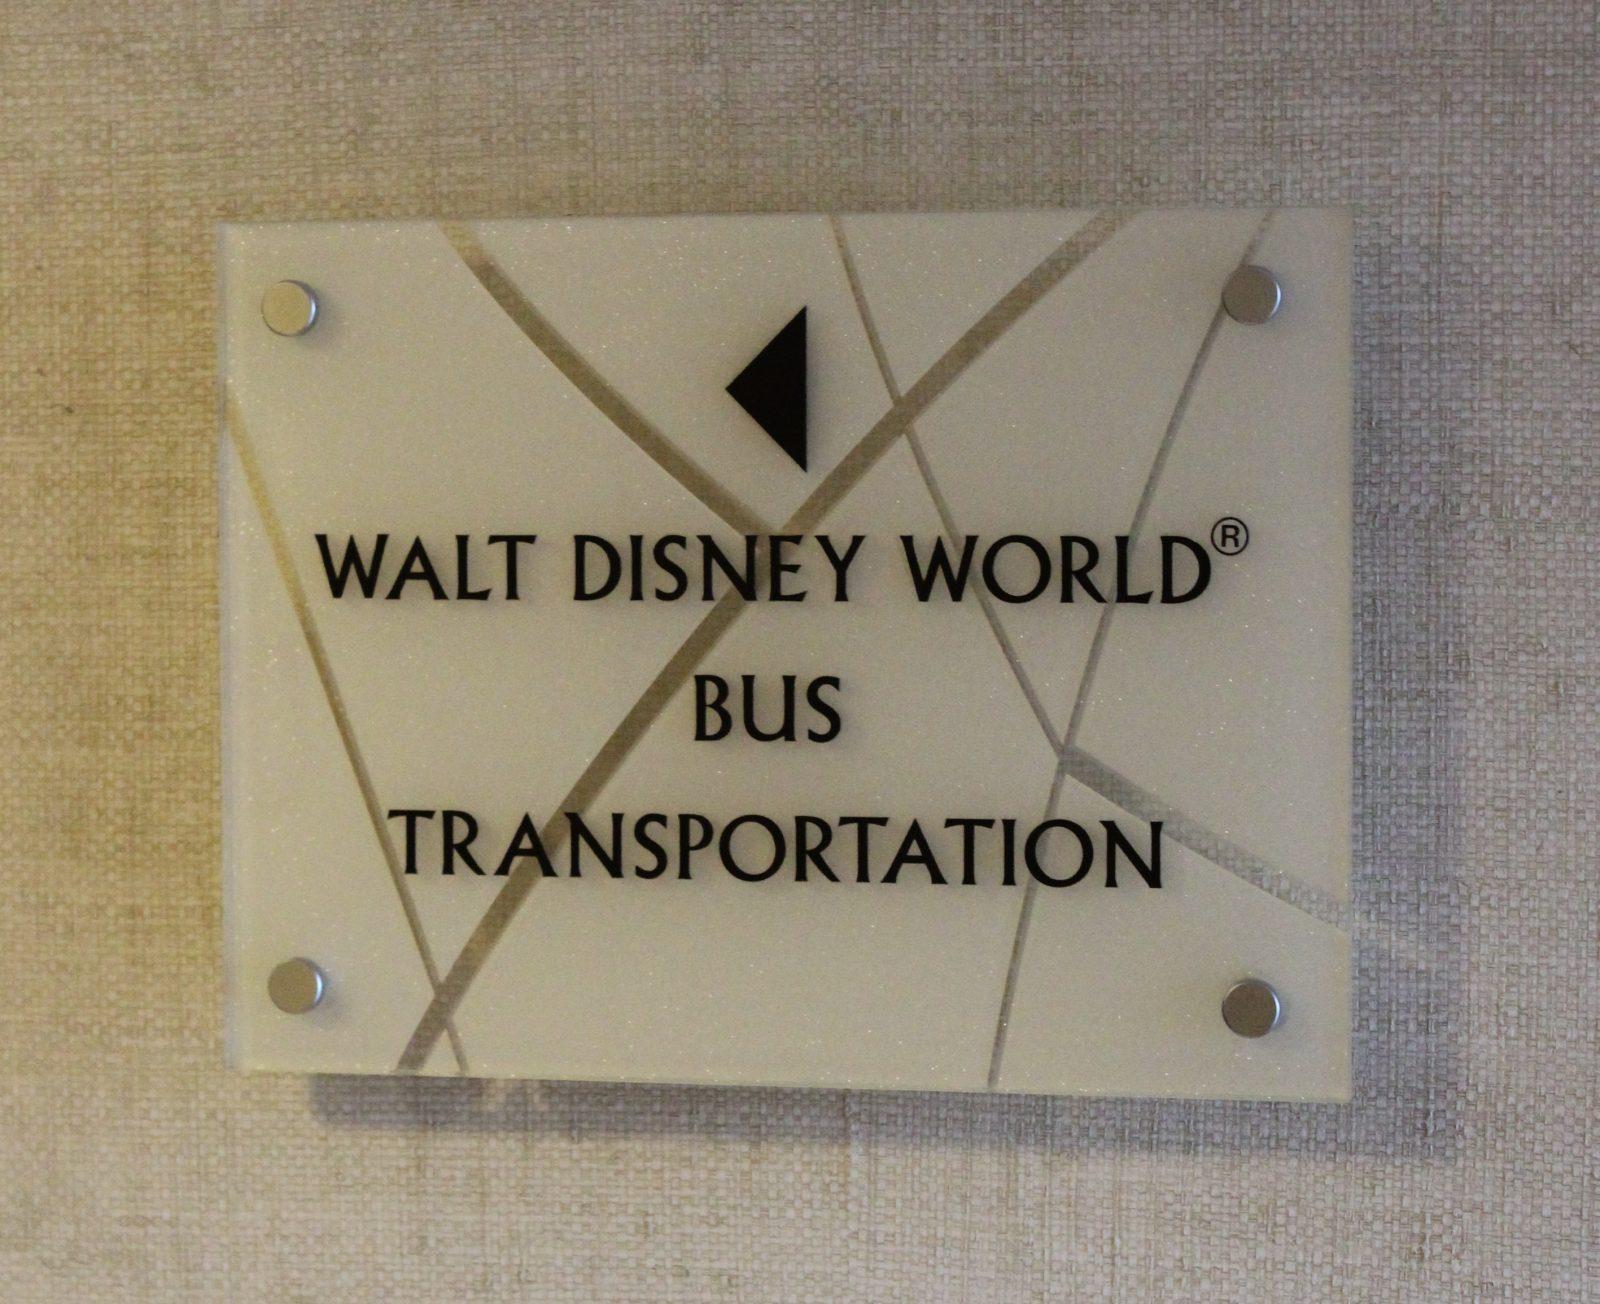 Walt Disney World Bus Transportation Directional Sign